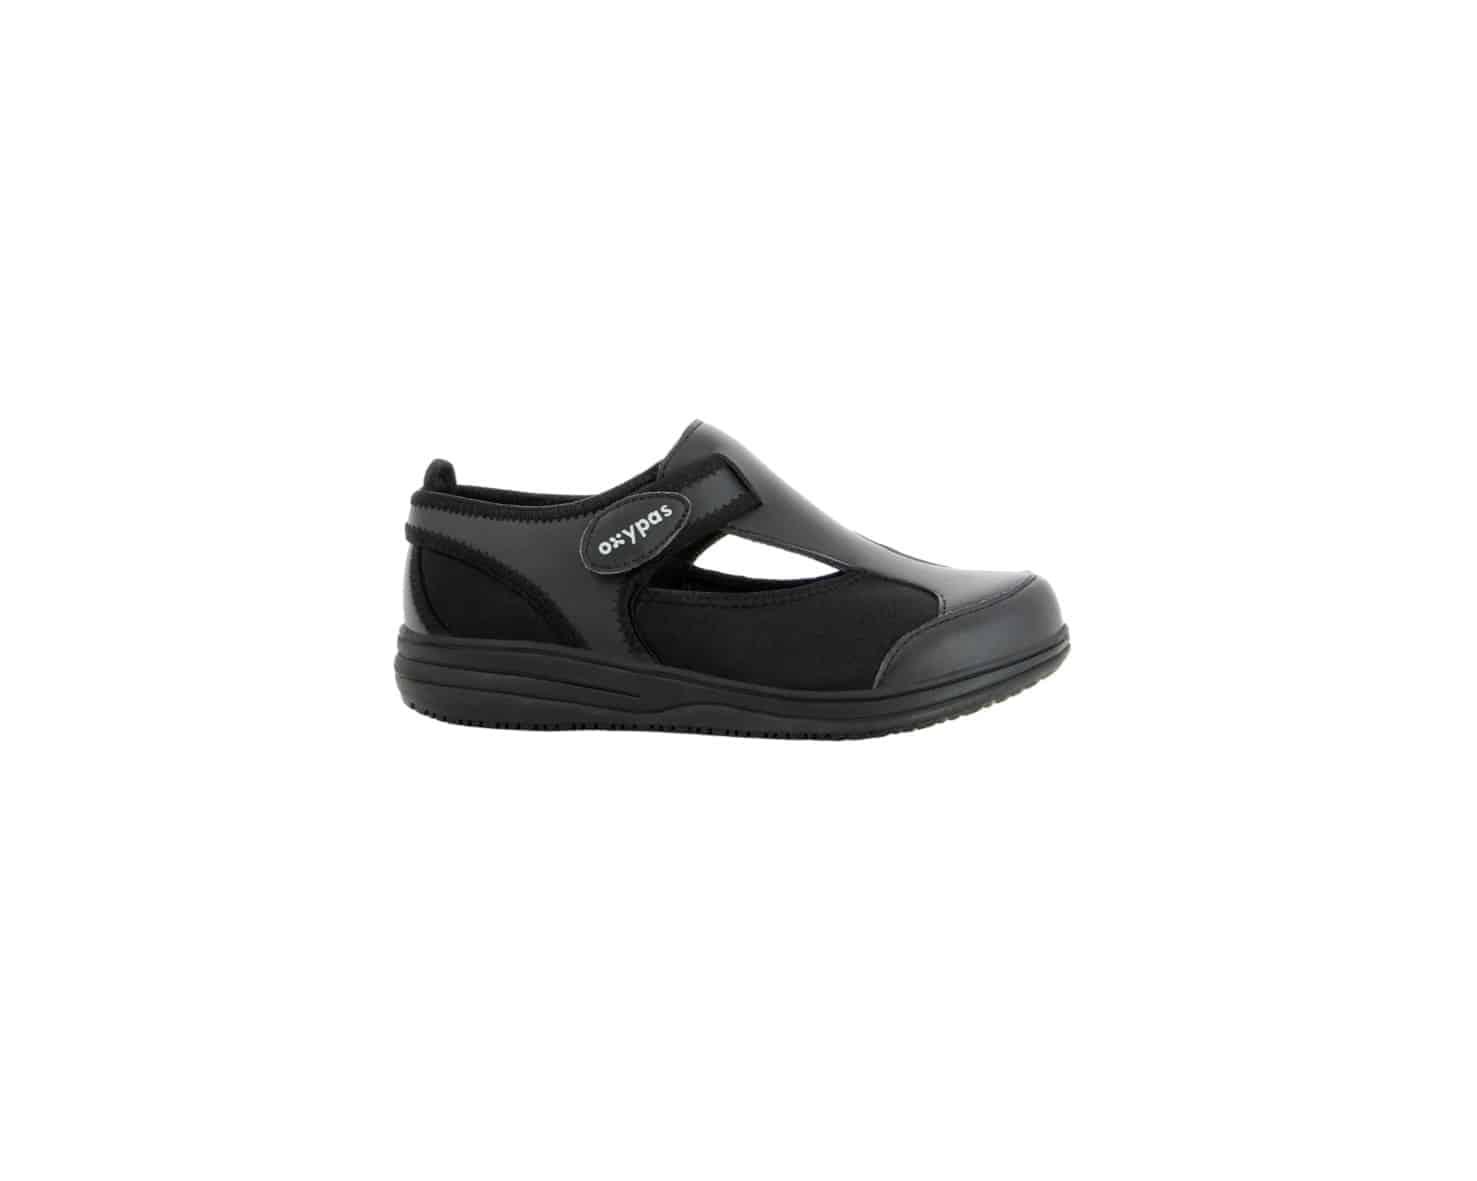 Oxypas Medilogic 'Candy' Comfortable Anti-slip, Anti-static, Washable Nursing Shoes with Lycra